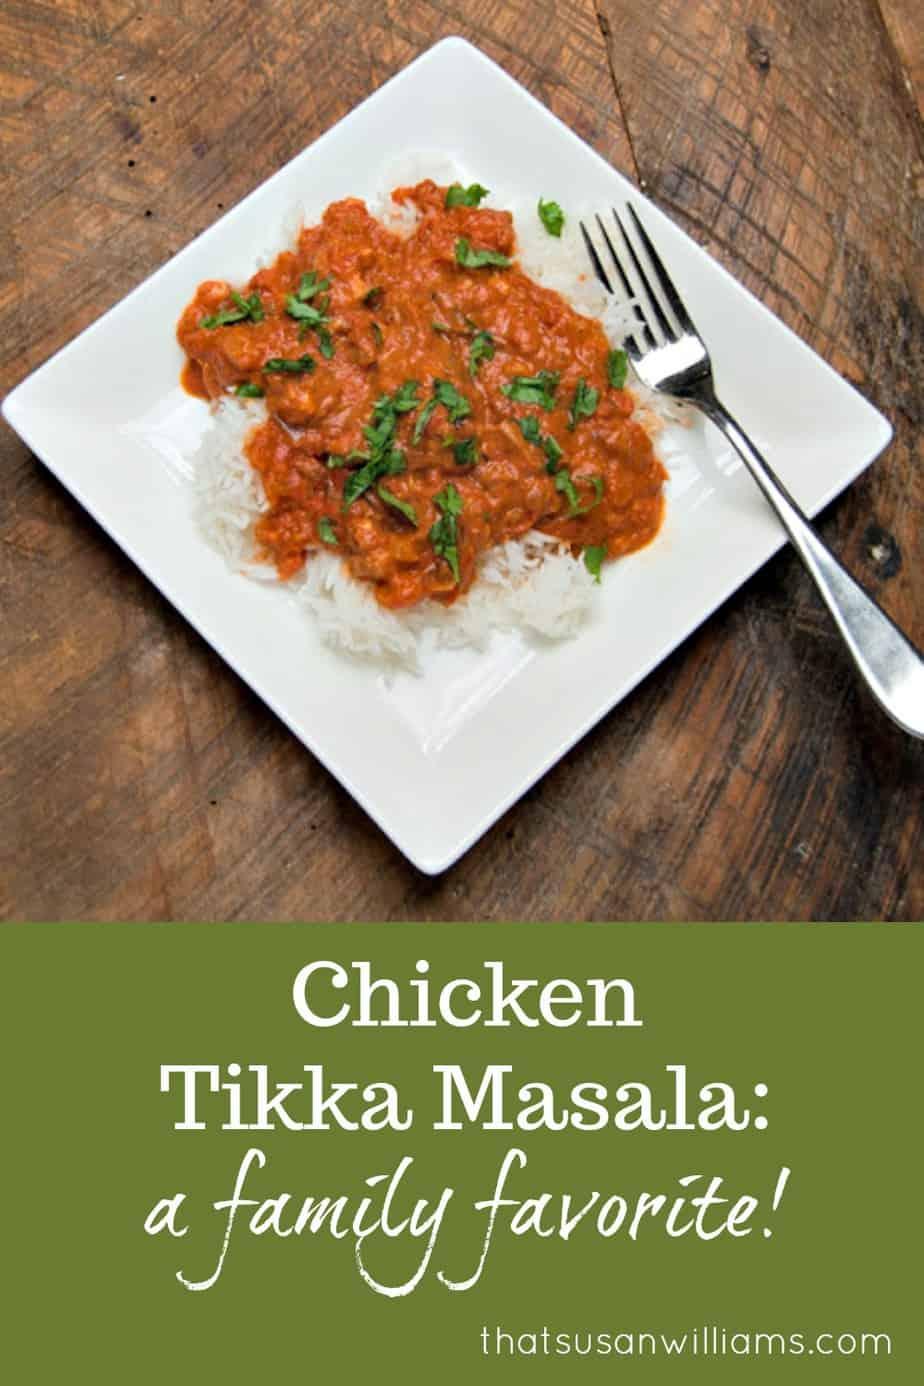 Chicken Tikka Masala: a family favorite #Indiancuisine #familyfavorite #weeknightmeal